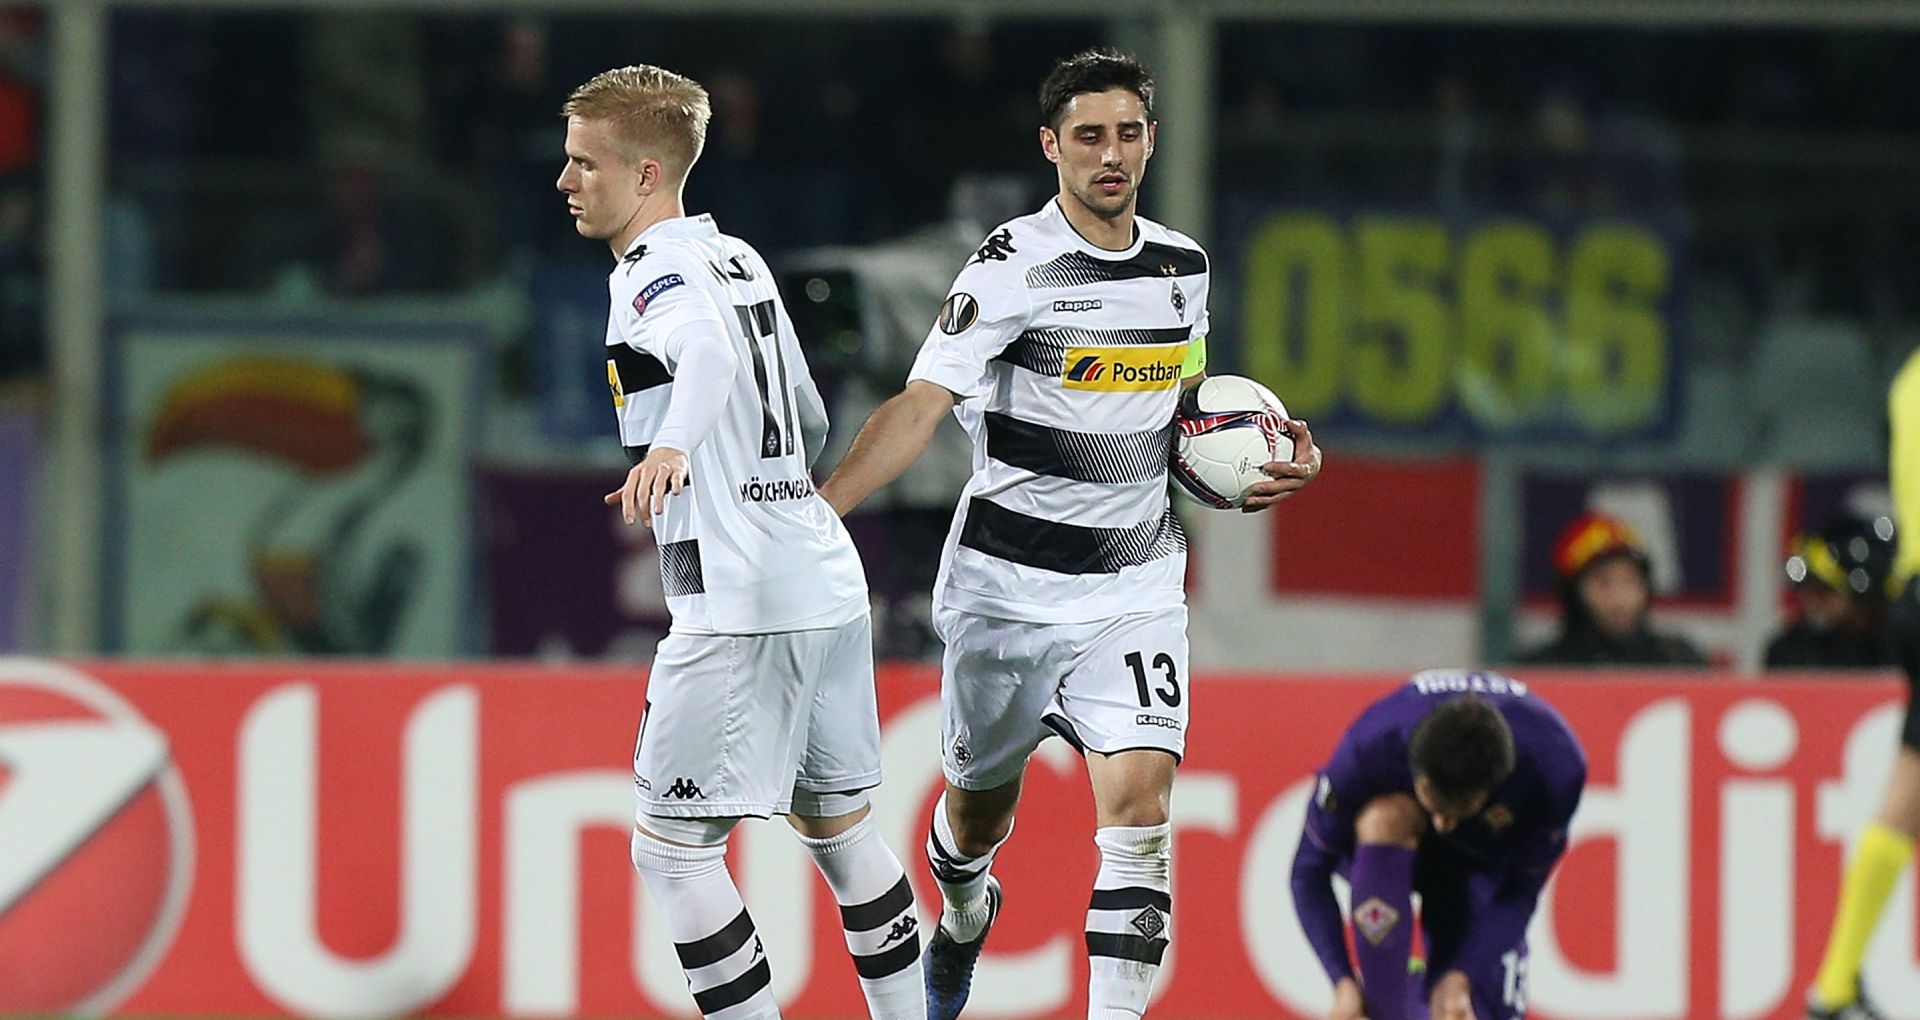 Lars Stindl Fiorentina Borussia Monchengladbach Europa League